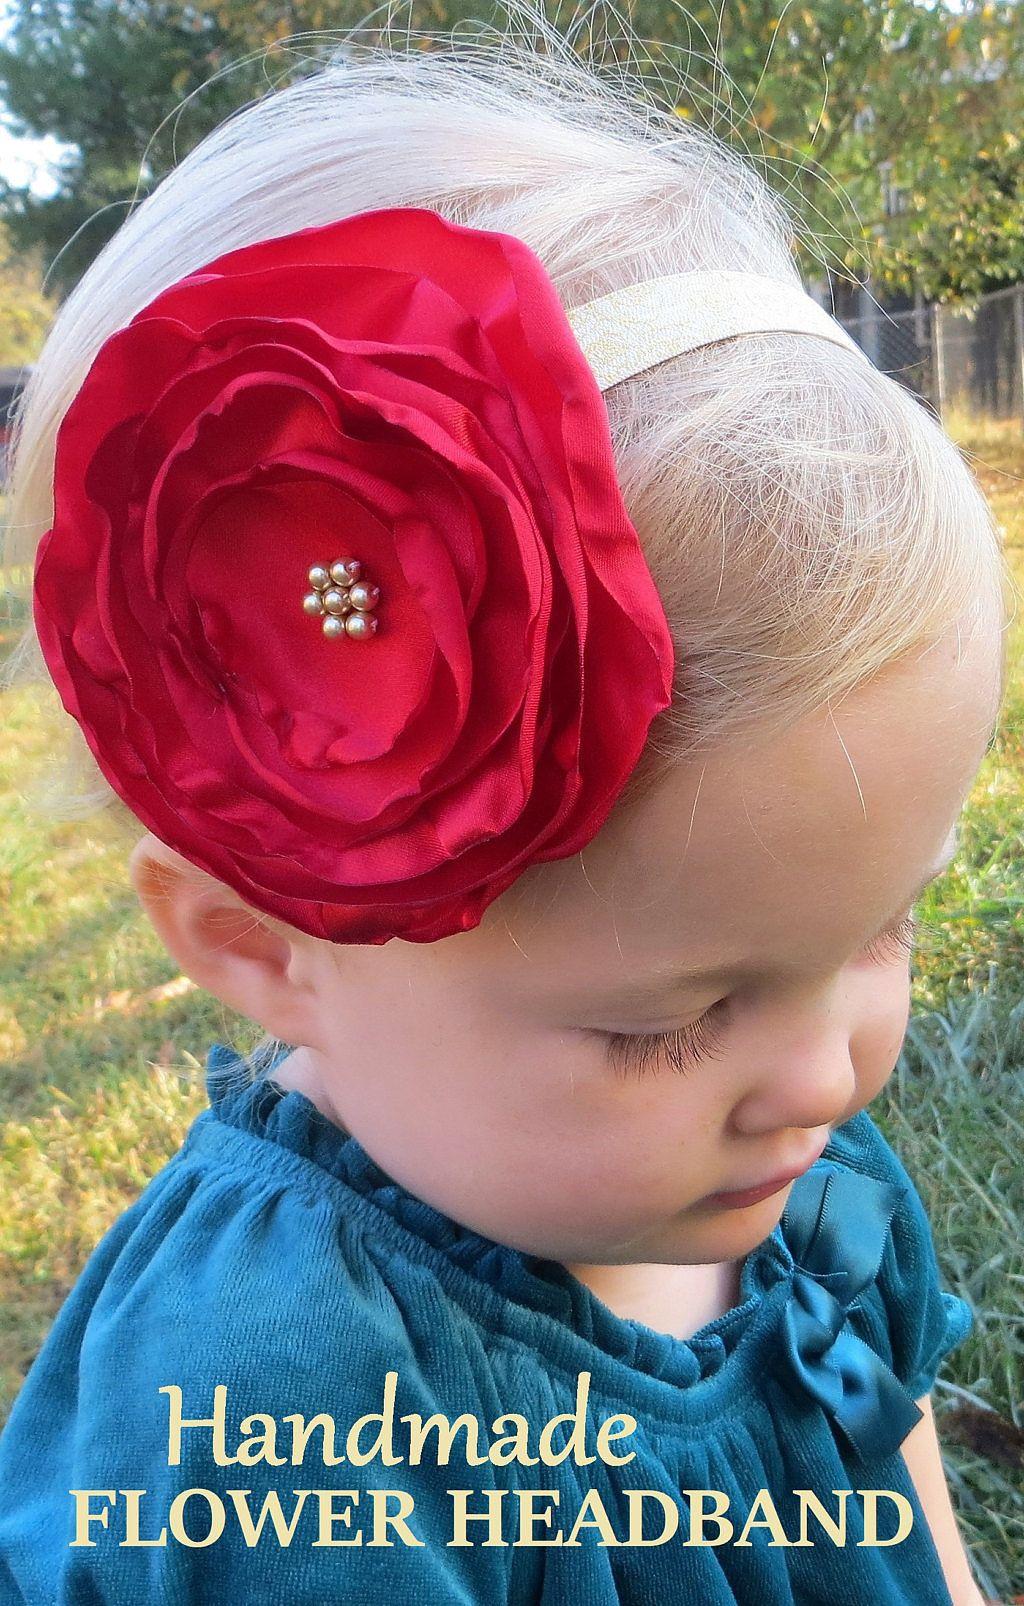 Jute Headband Band Headband Handmade Photo Props Baby Kids